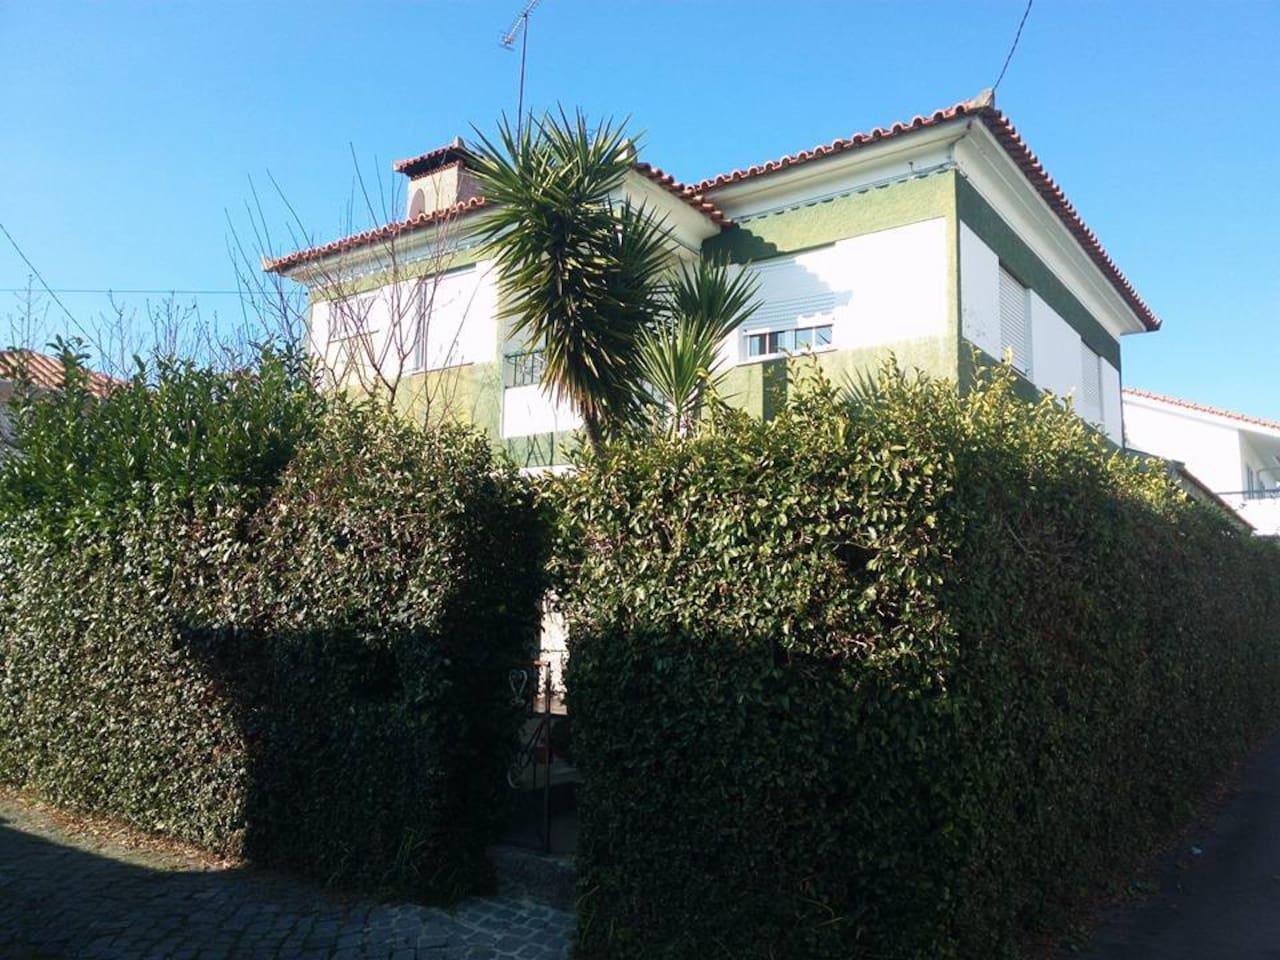 Vista exterior. Travessa das Flores, n. 2 - Lordelo (Guimarães) - 4815-214 Lordelo GMR